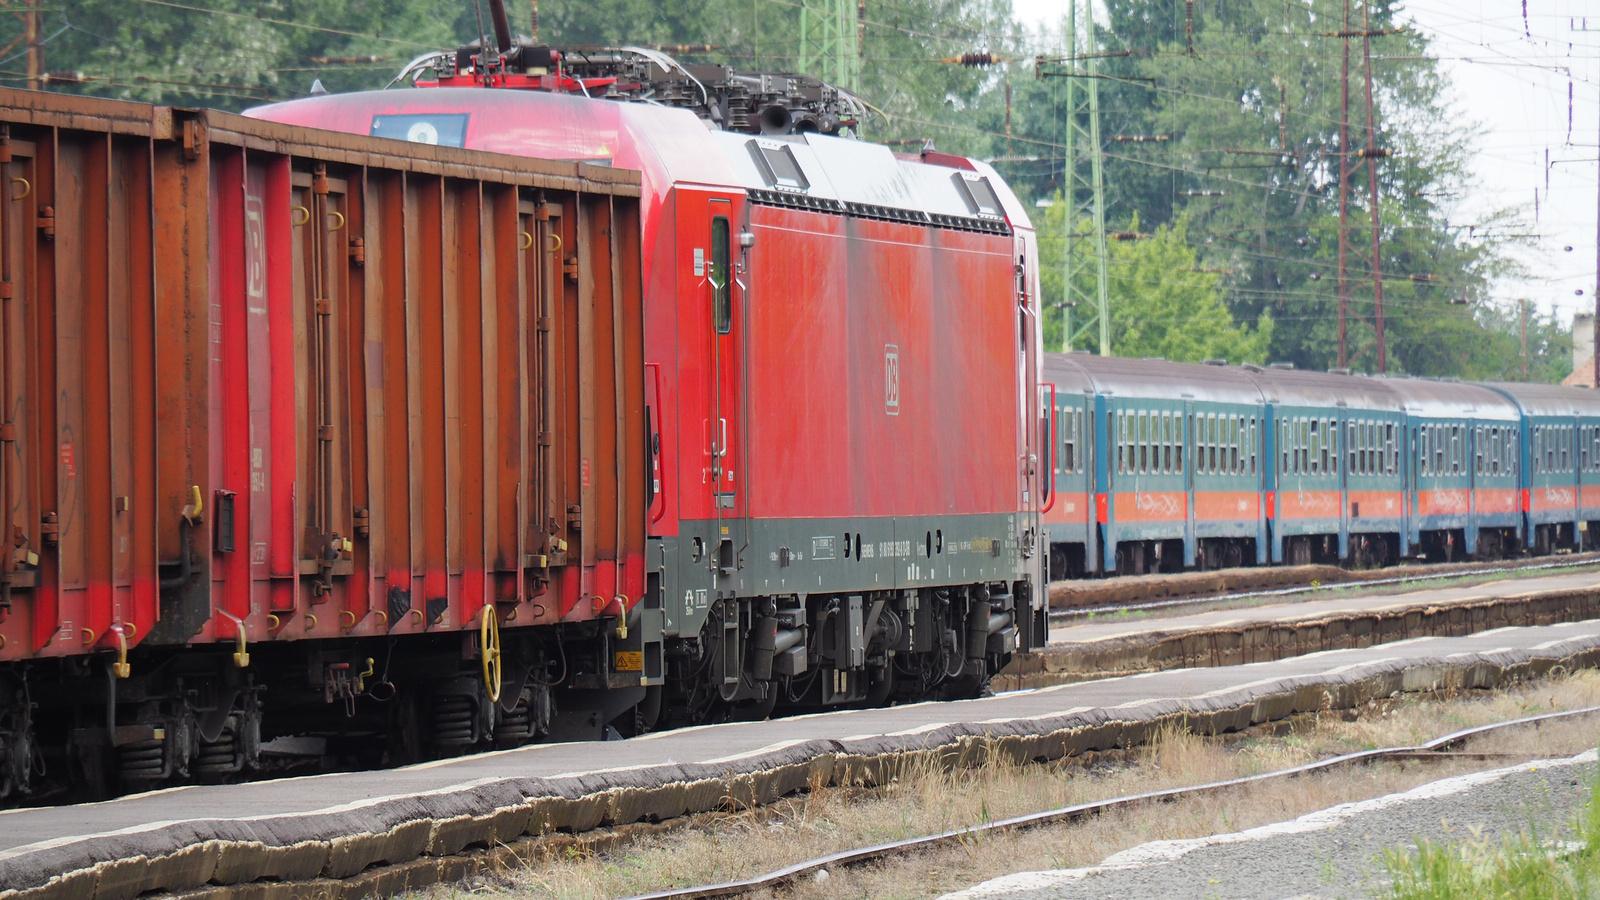 D-DB 91 80 6193 392-8, SzG3